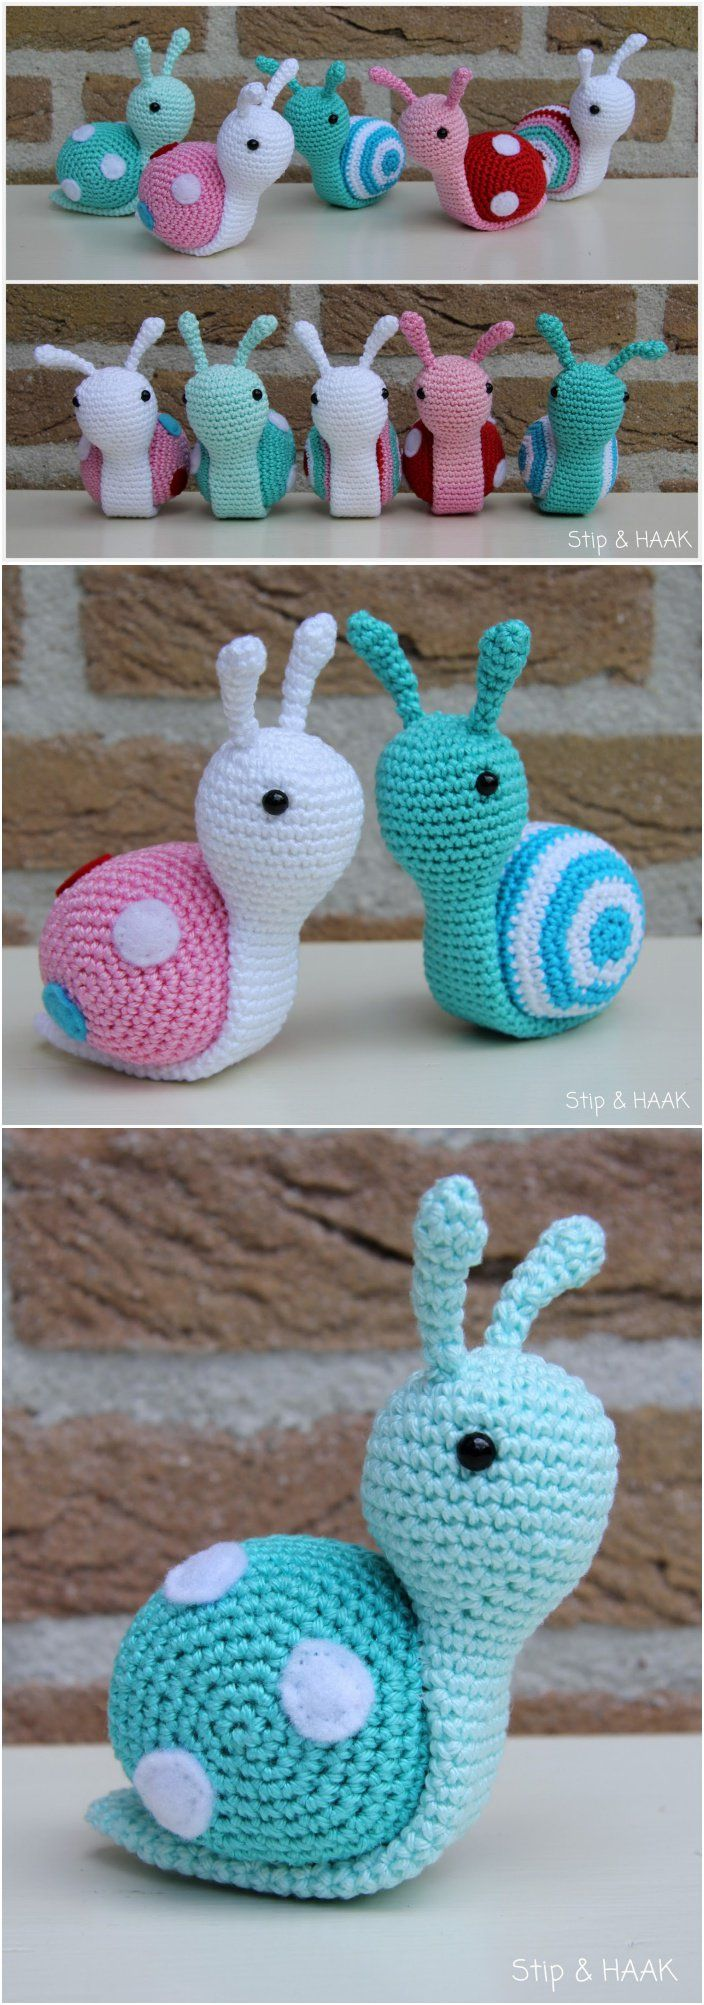 Crochet Amigurumi Snail with Free Pattern